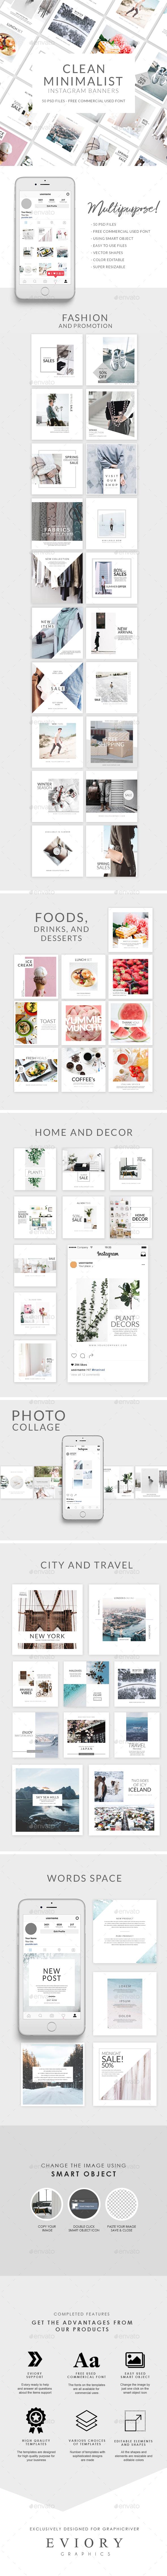 Clean Minimalist Instagram Banner - Banners & Ads Web Elements